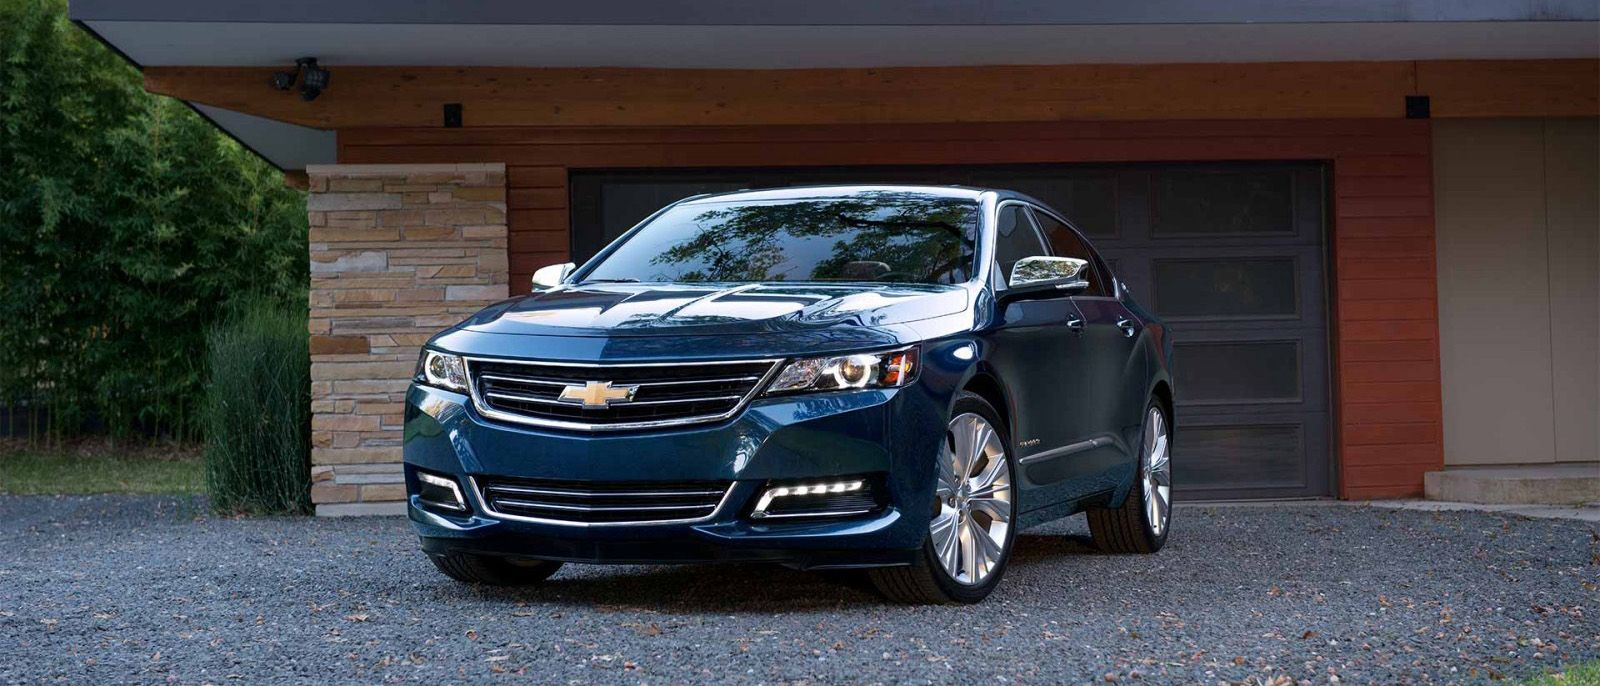 2017 Chevrolet Impala Chevrolet impala, Car chevrolet